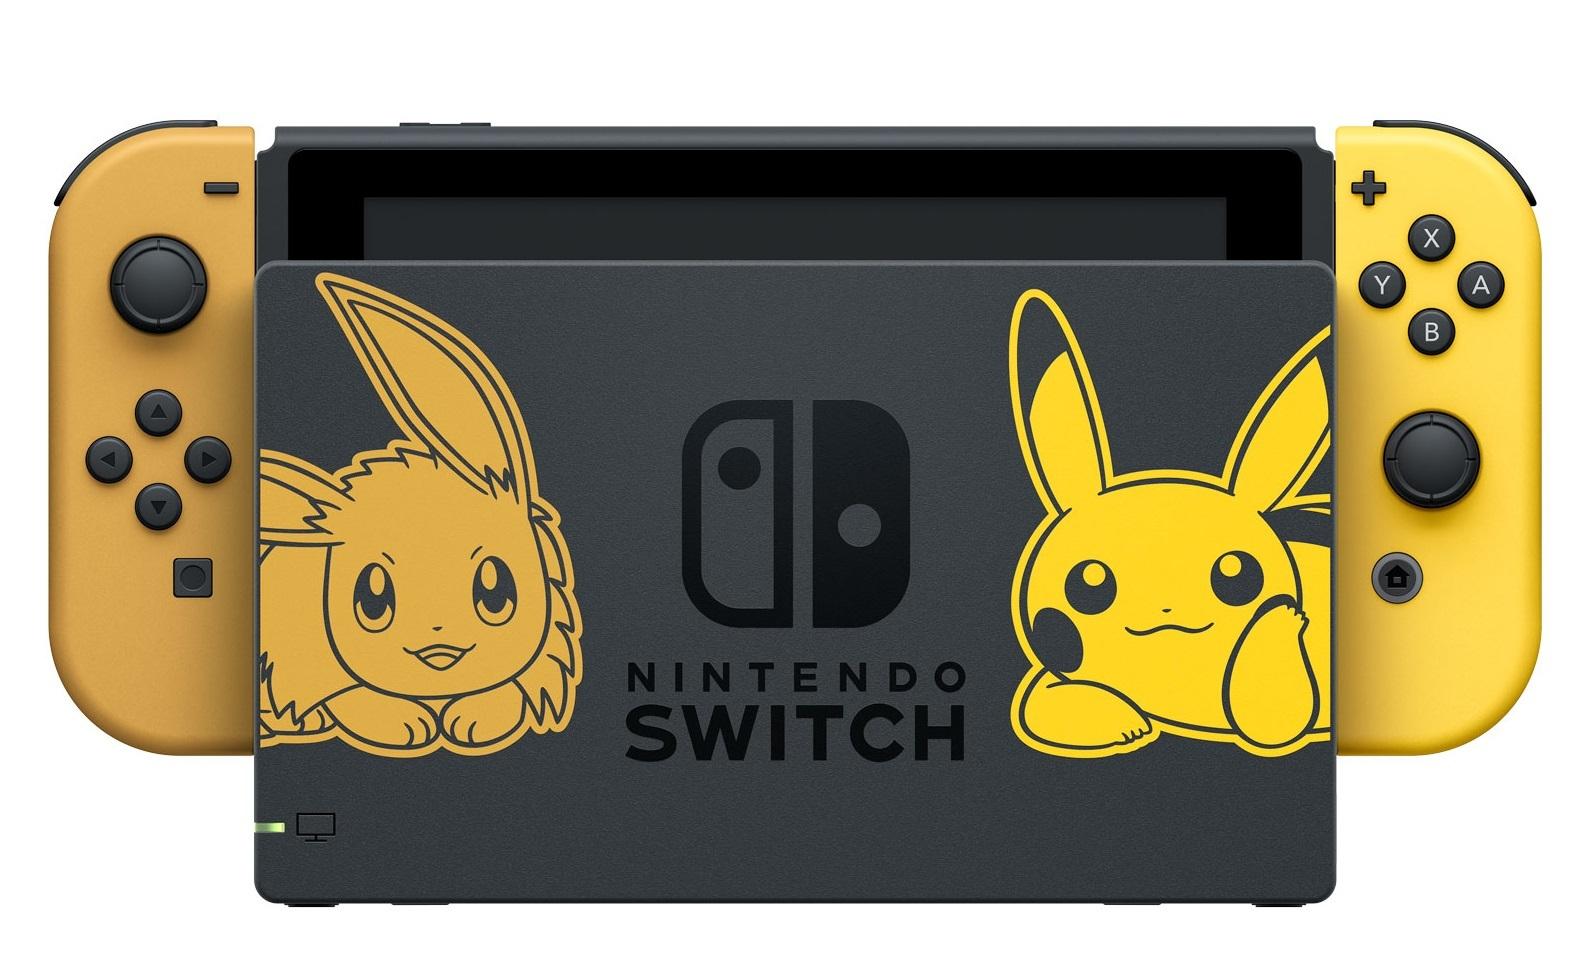 Nintendo Switch Console - Pokemon: Let's Go, Pikachu! for Nintendo Switch image